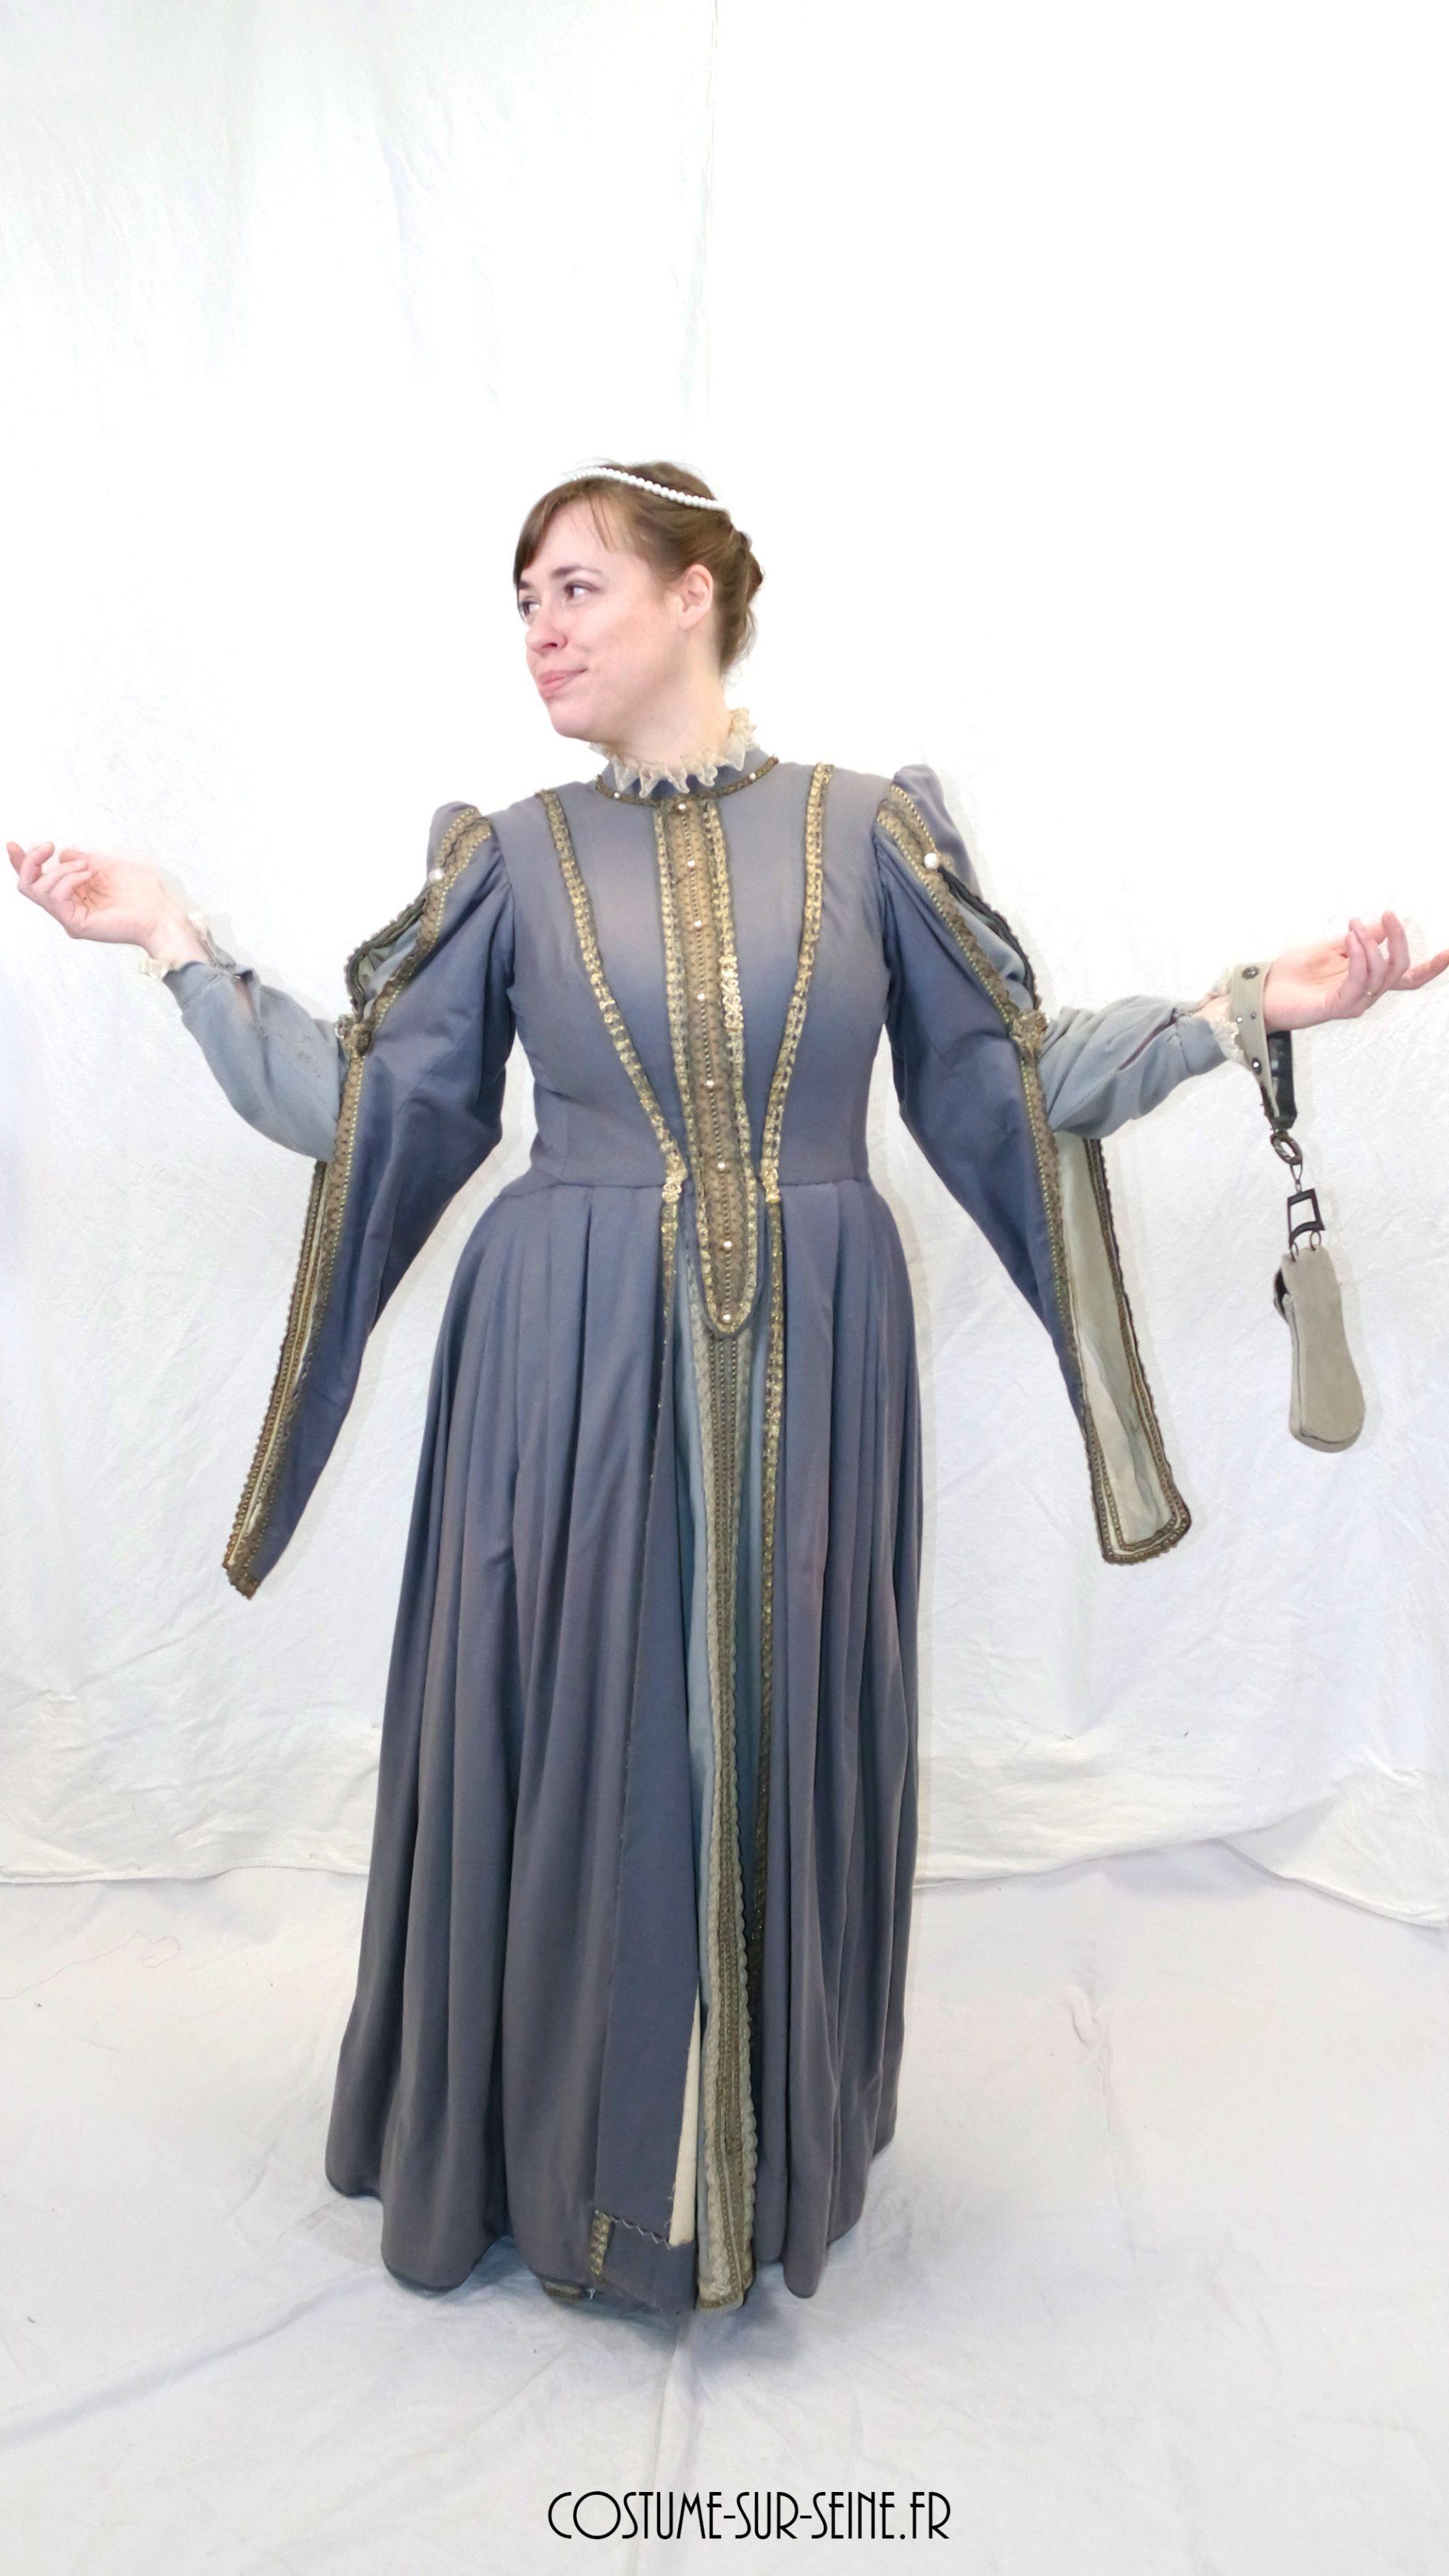 costume Robe renaissanceURES